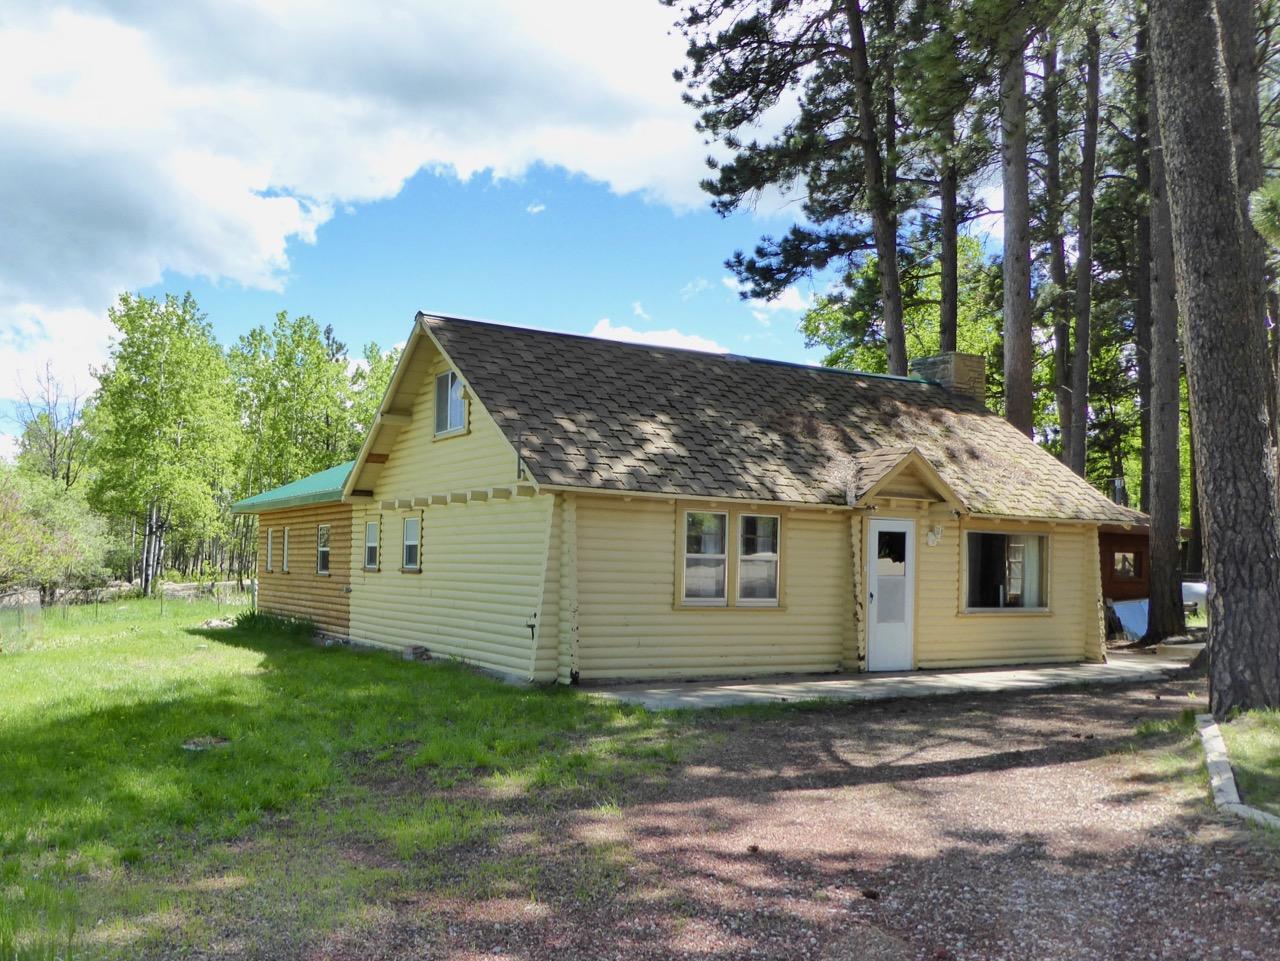 222 Fish Hatchery Road, Story, Wyoming 82842, 2 Bedrooms Bedrooms, ,2 BathroomsBathrooms,Residential,For Sale,Fish Hatchery,19-559